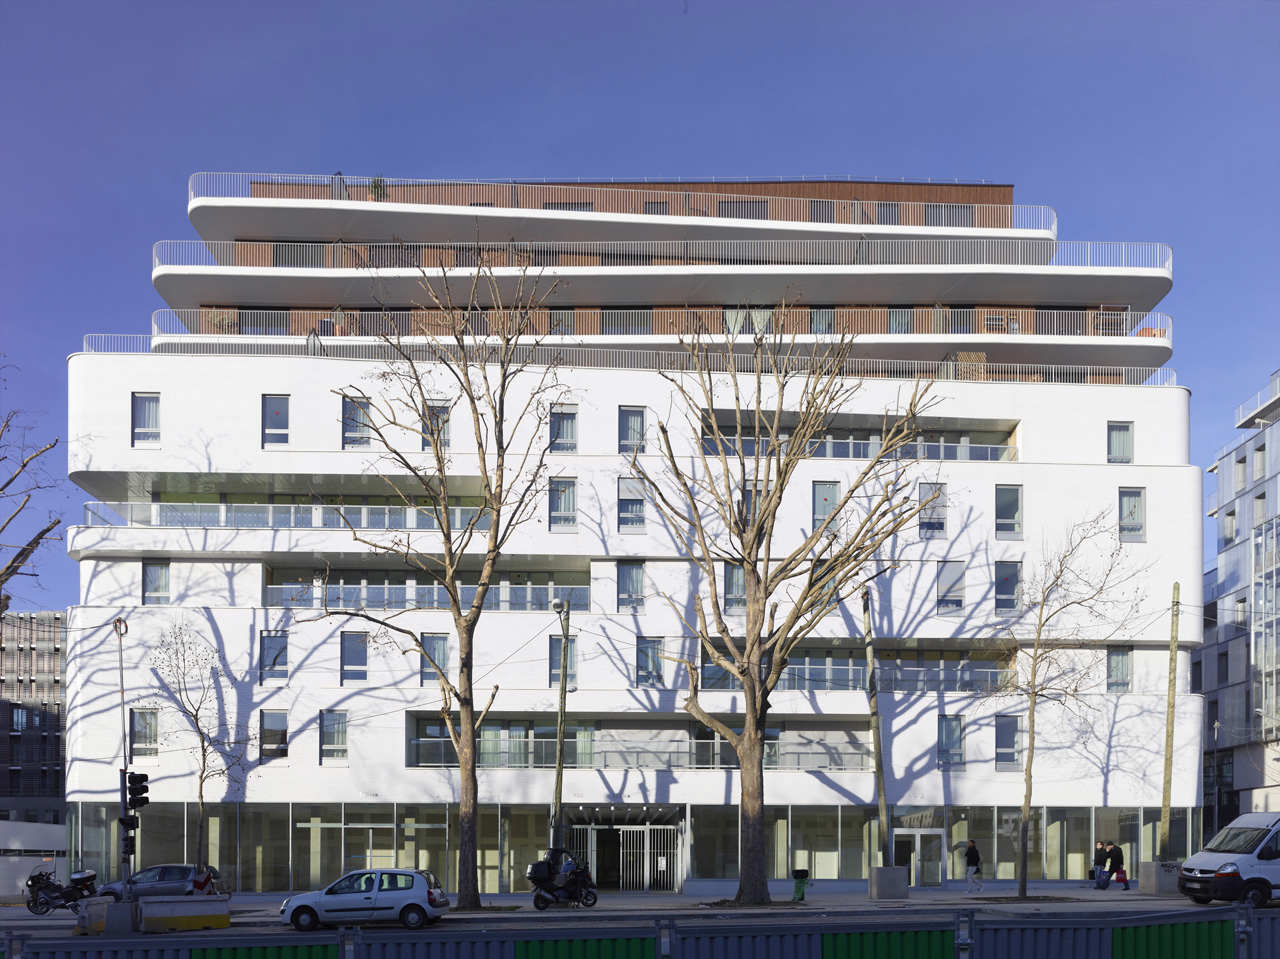 Zac Claude Bernard Multifunctional Building / Atelier Zündel & Cristea, © Stephane Chalmeau